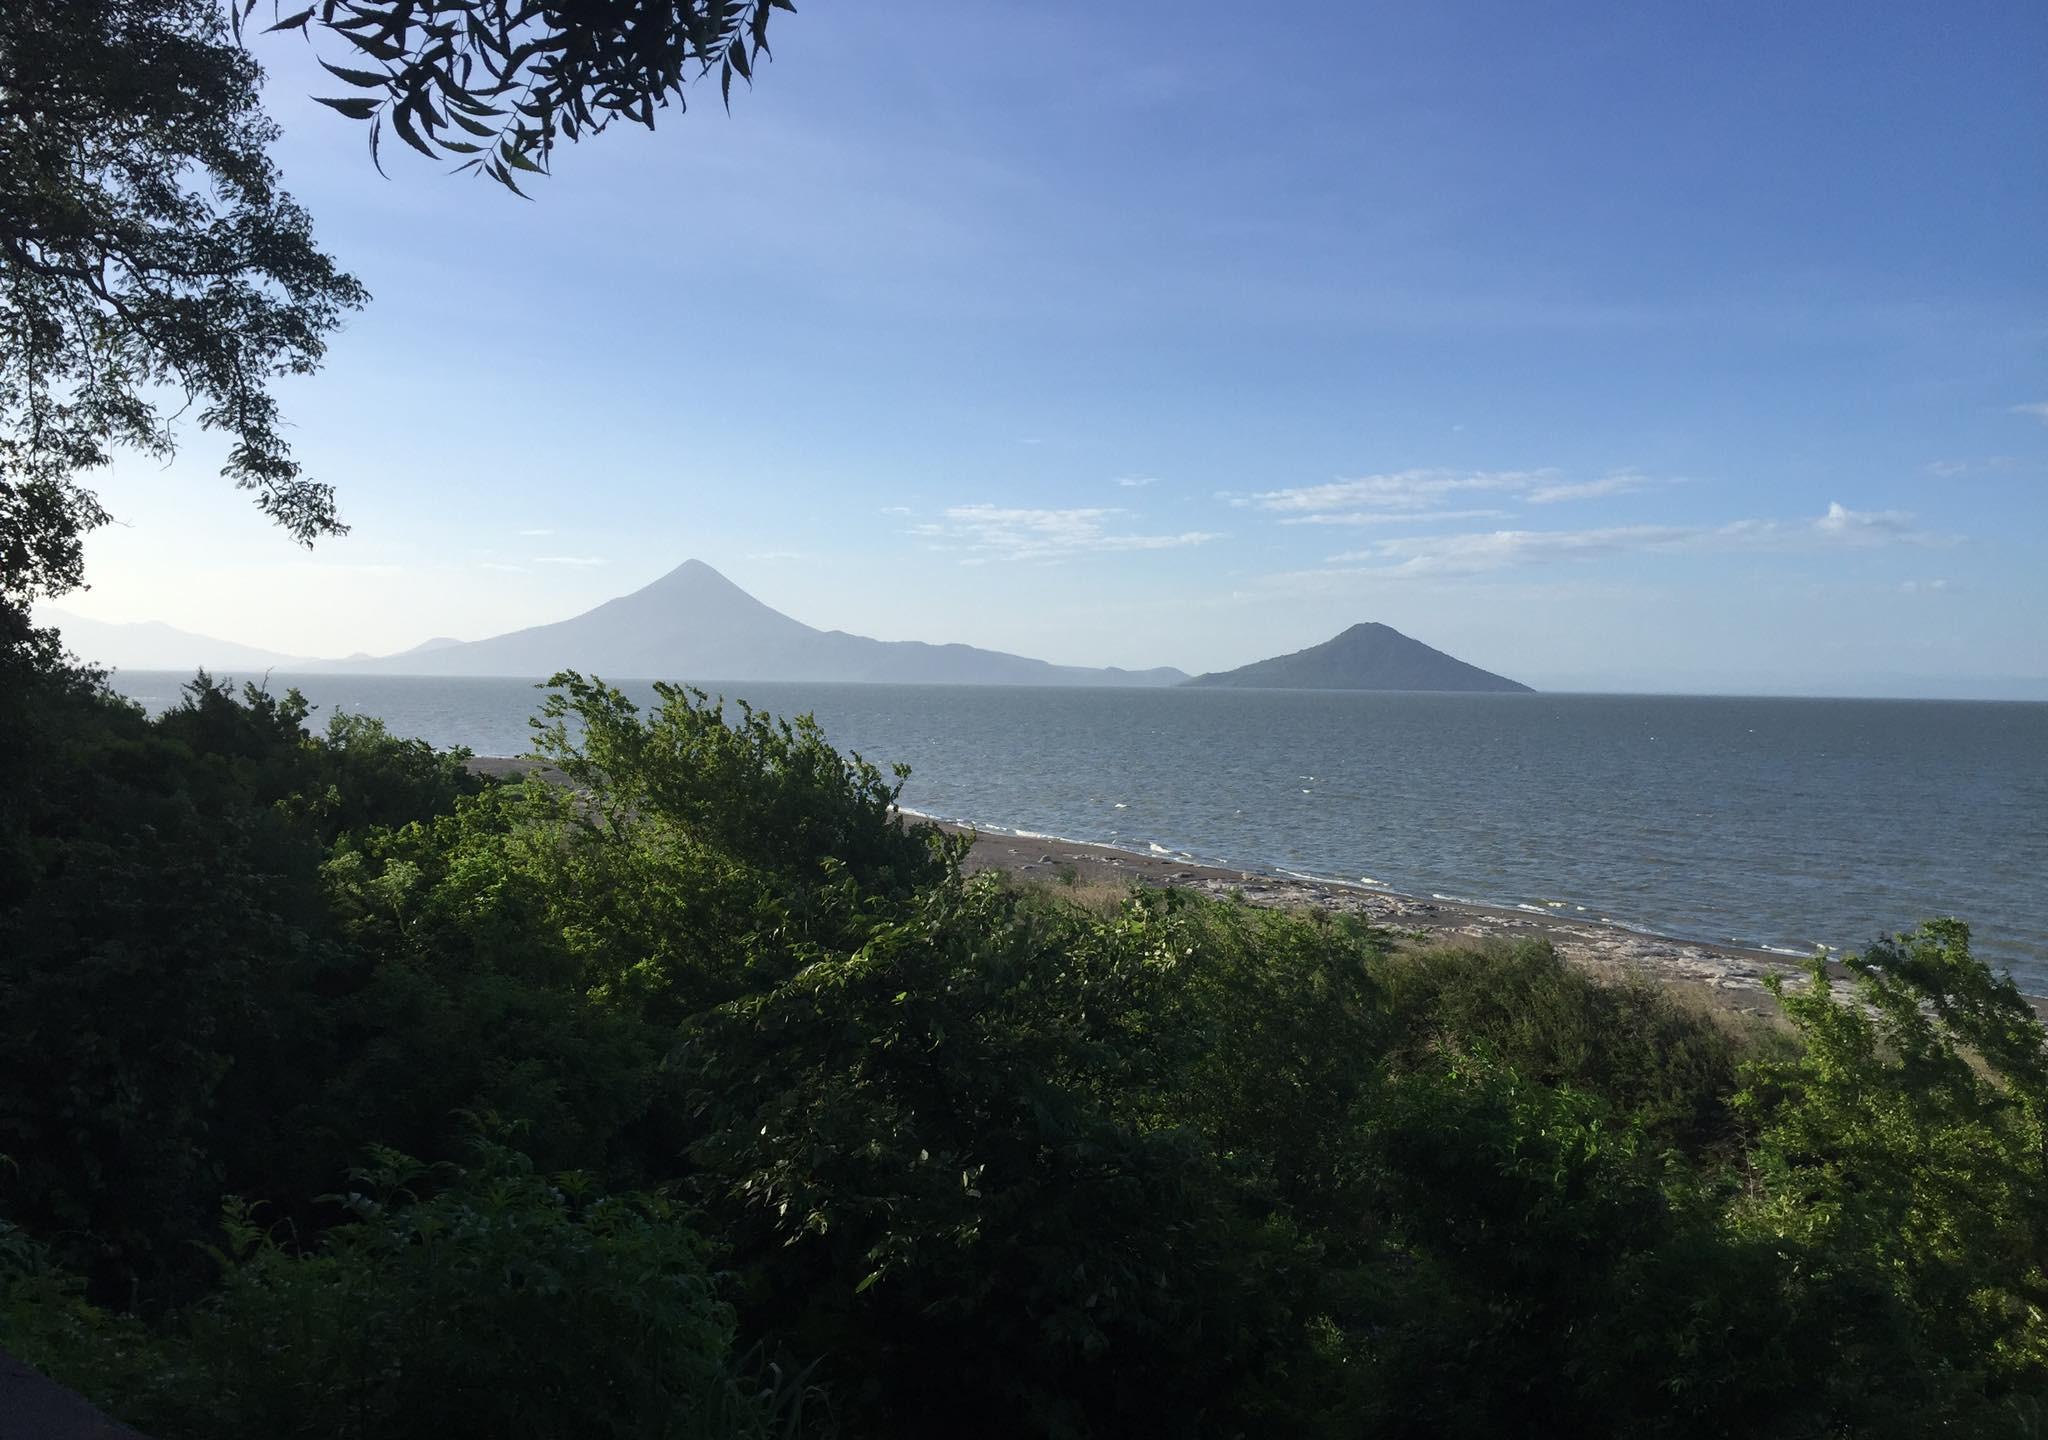 Nicaragua, land of volcanoes & lakes